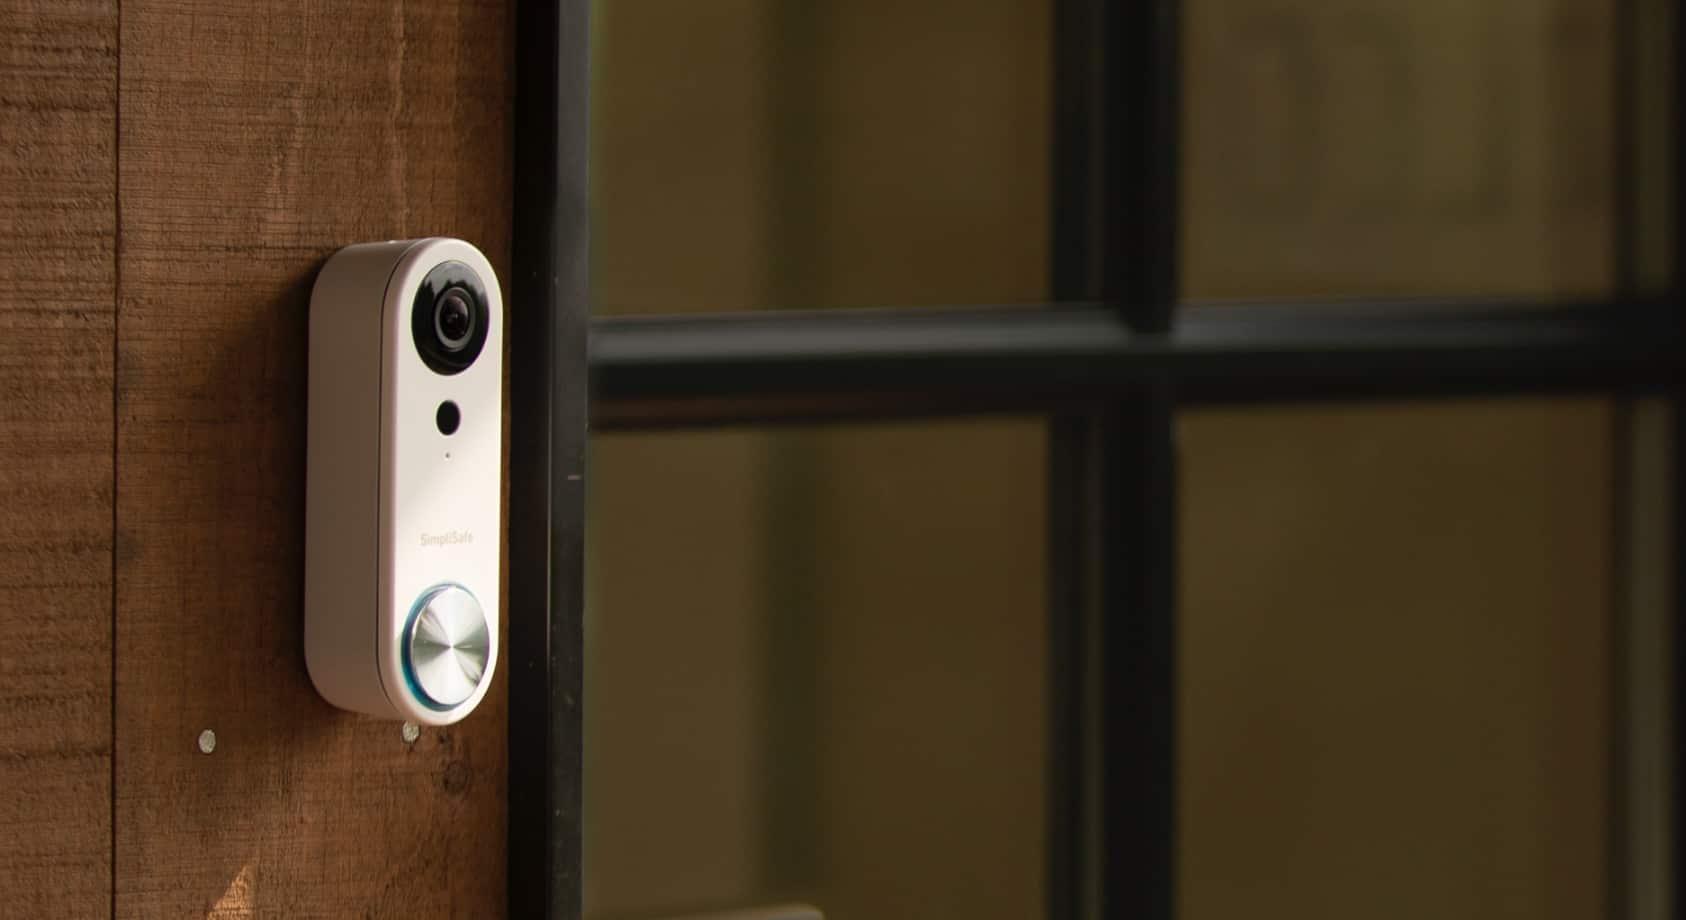 Simplisafe Camera Review Cost Amp Pricing 2019 Simplicam